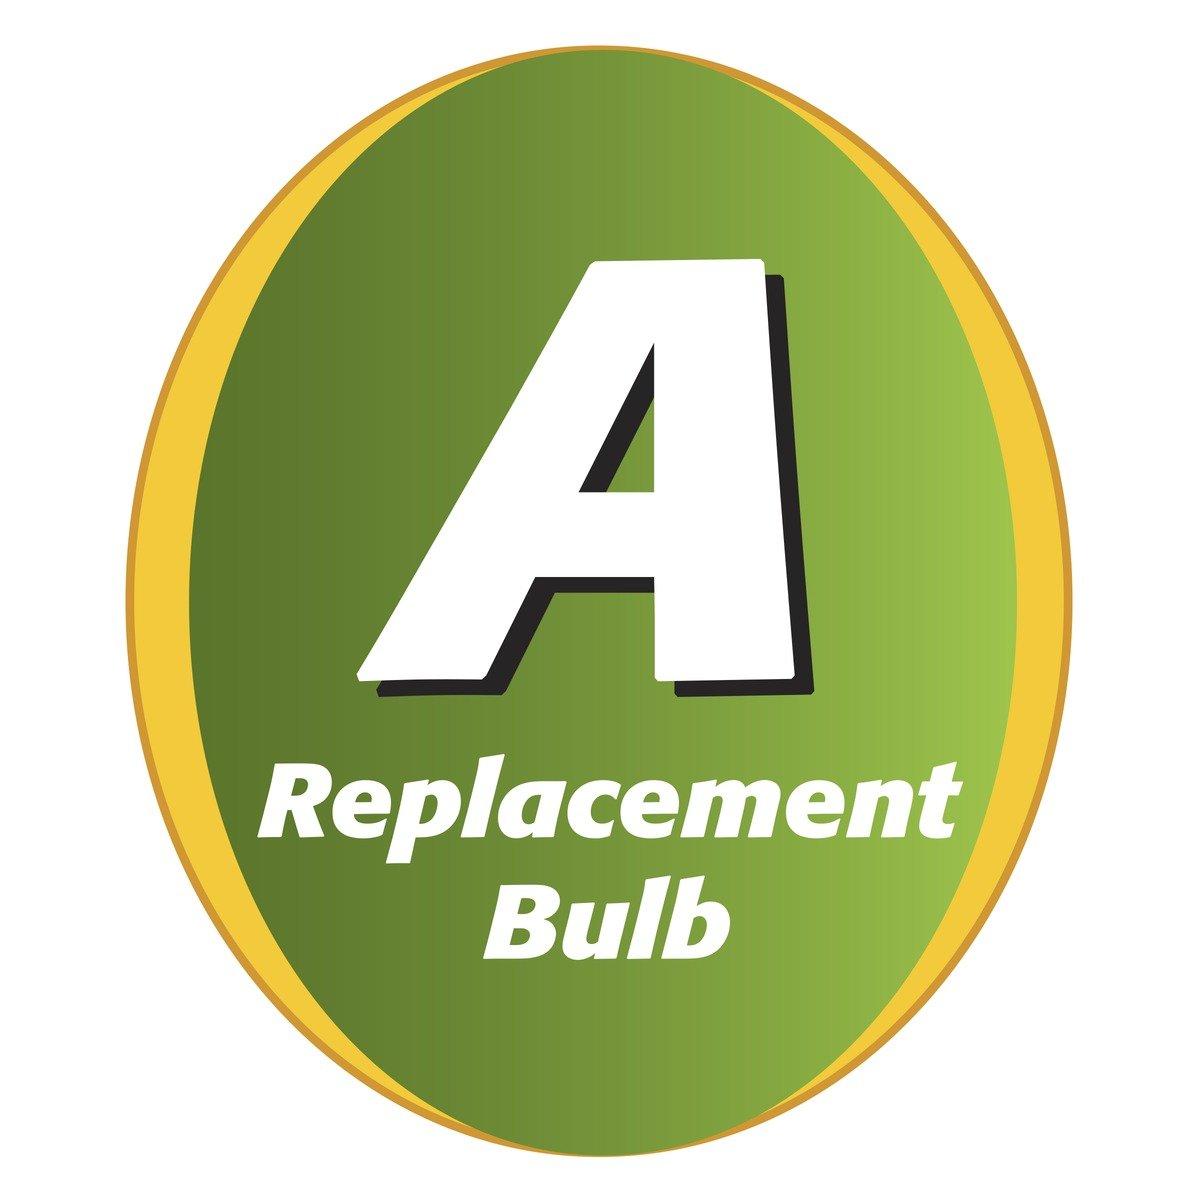 Stinger B24B Replacement Bulb for BK300 or BK500 Bug Killers Black